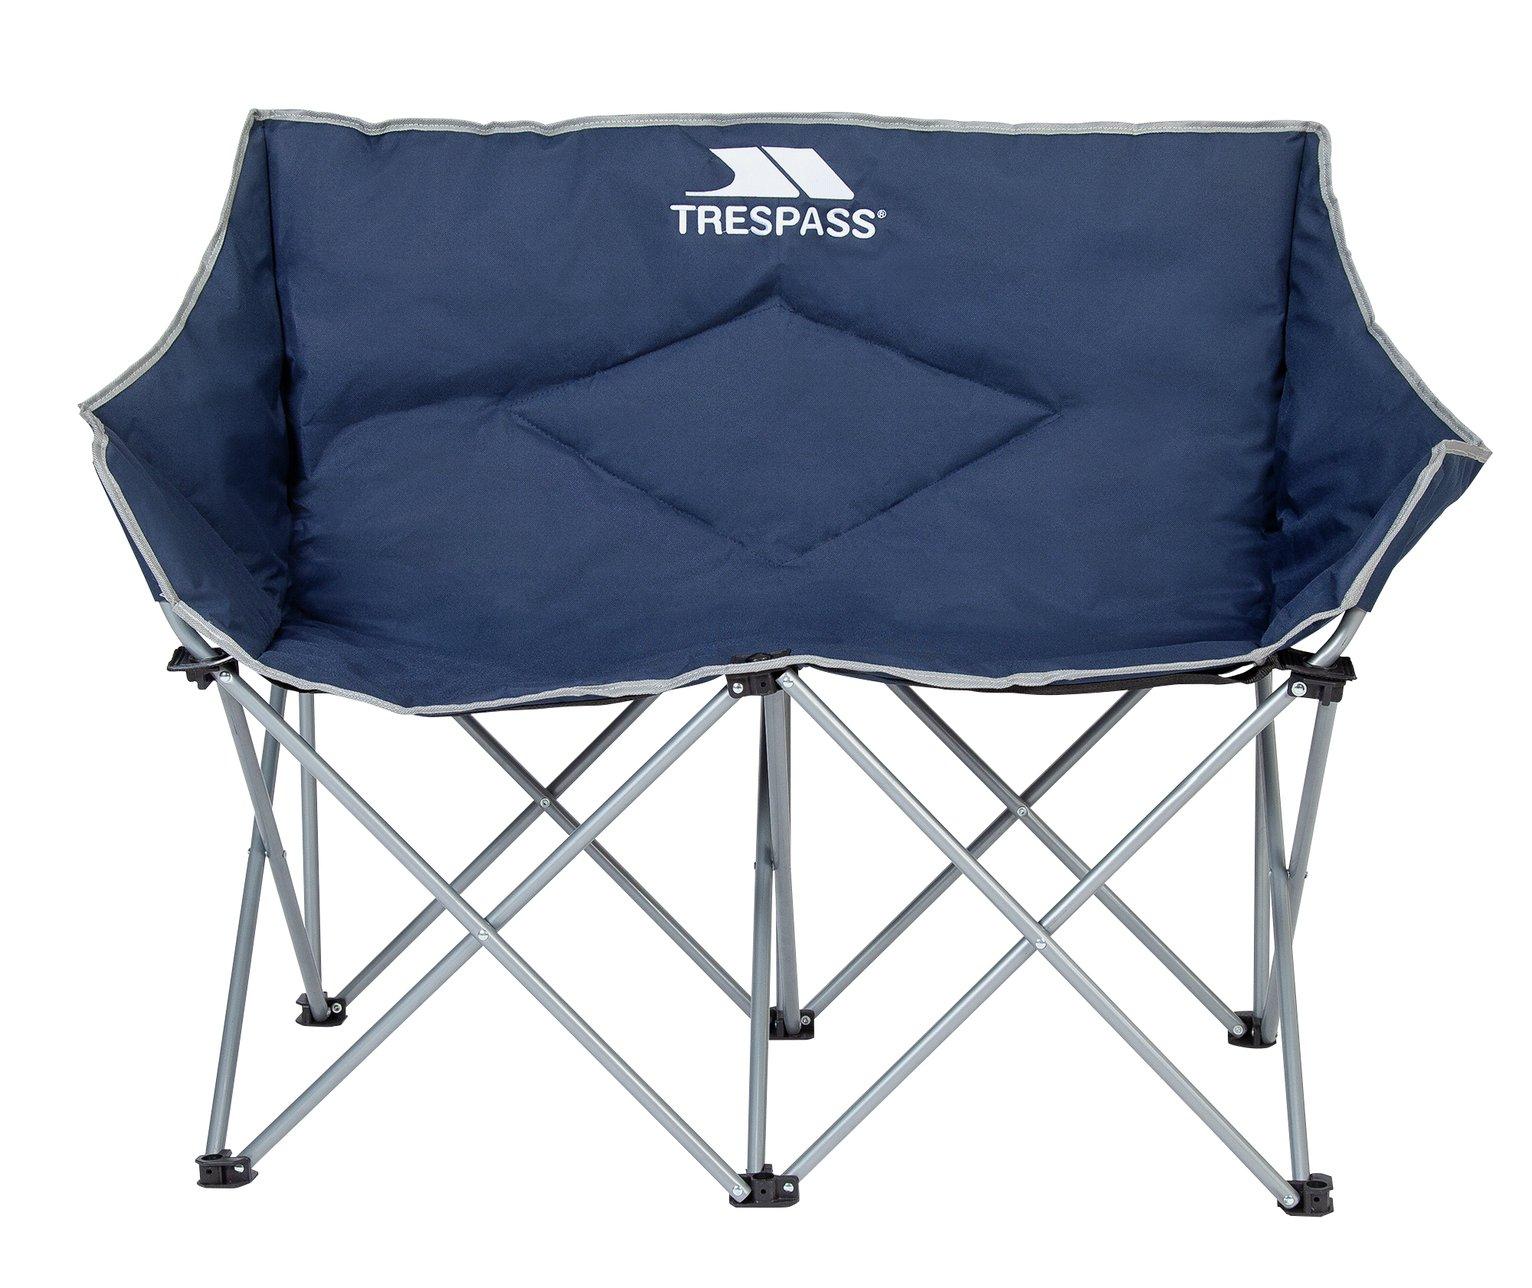 Trespass Double Seat Folding Chair £20 @ Argos (free collection)